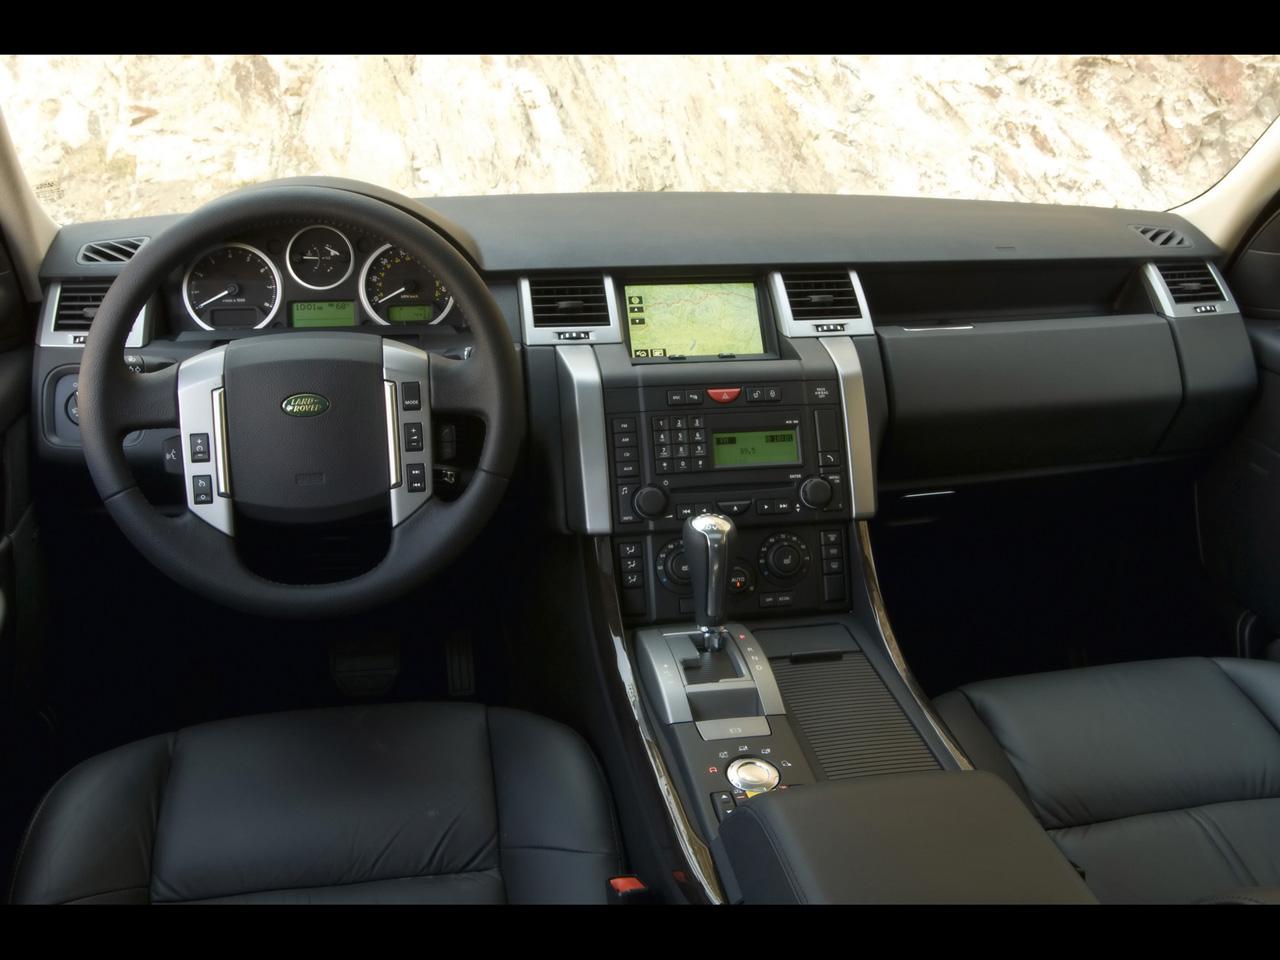 http://4.bp.blogspot.com/-6GtjehJRUwE/UbNxZlUBC9I/AAAAAAAAFRg/LXl_UEyZE3k/s1600/2008-Land-Rover-Range-Rover-Sport-Dashboard-1280x960.jpg